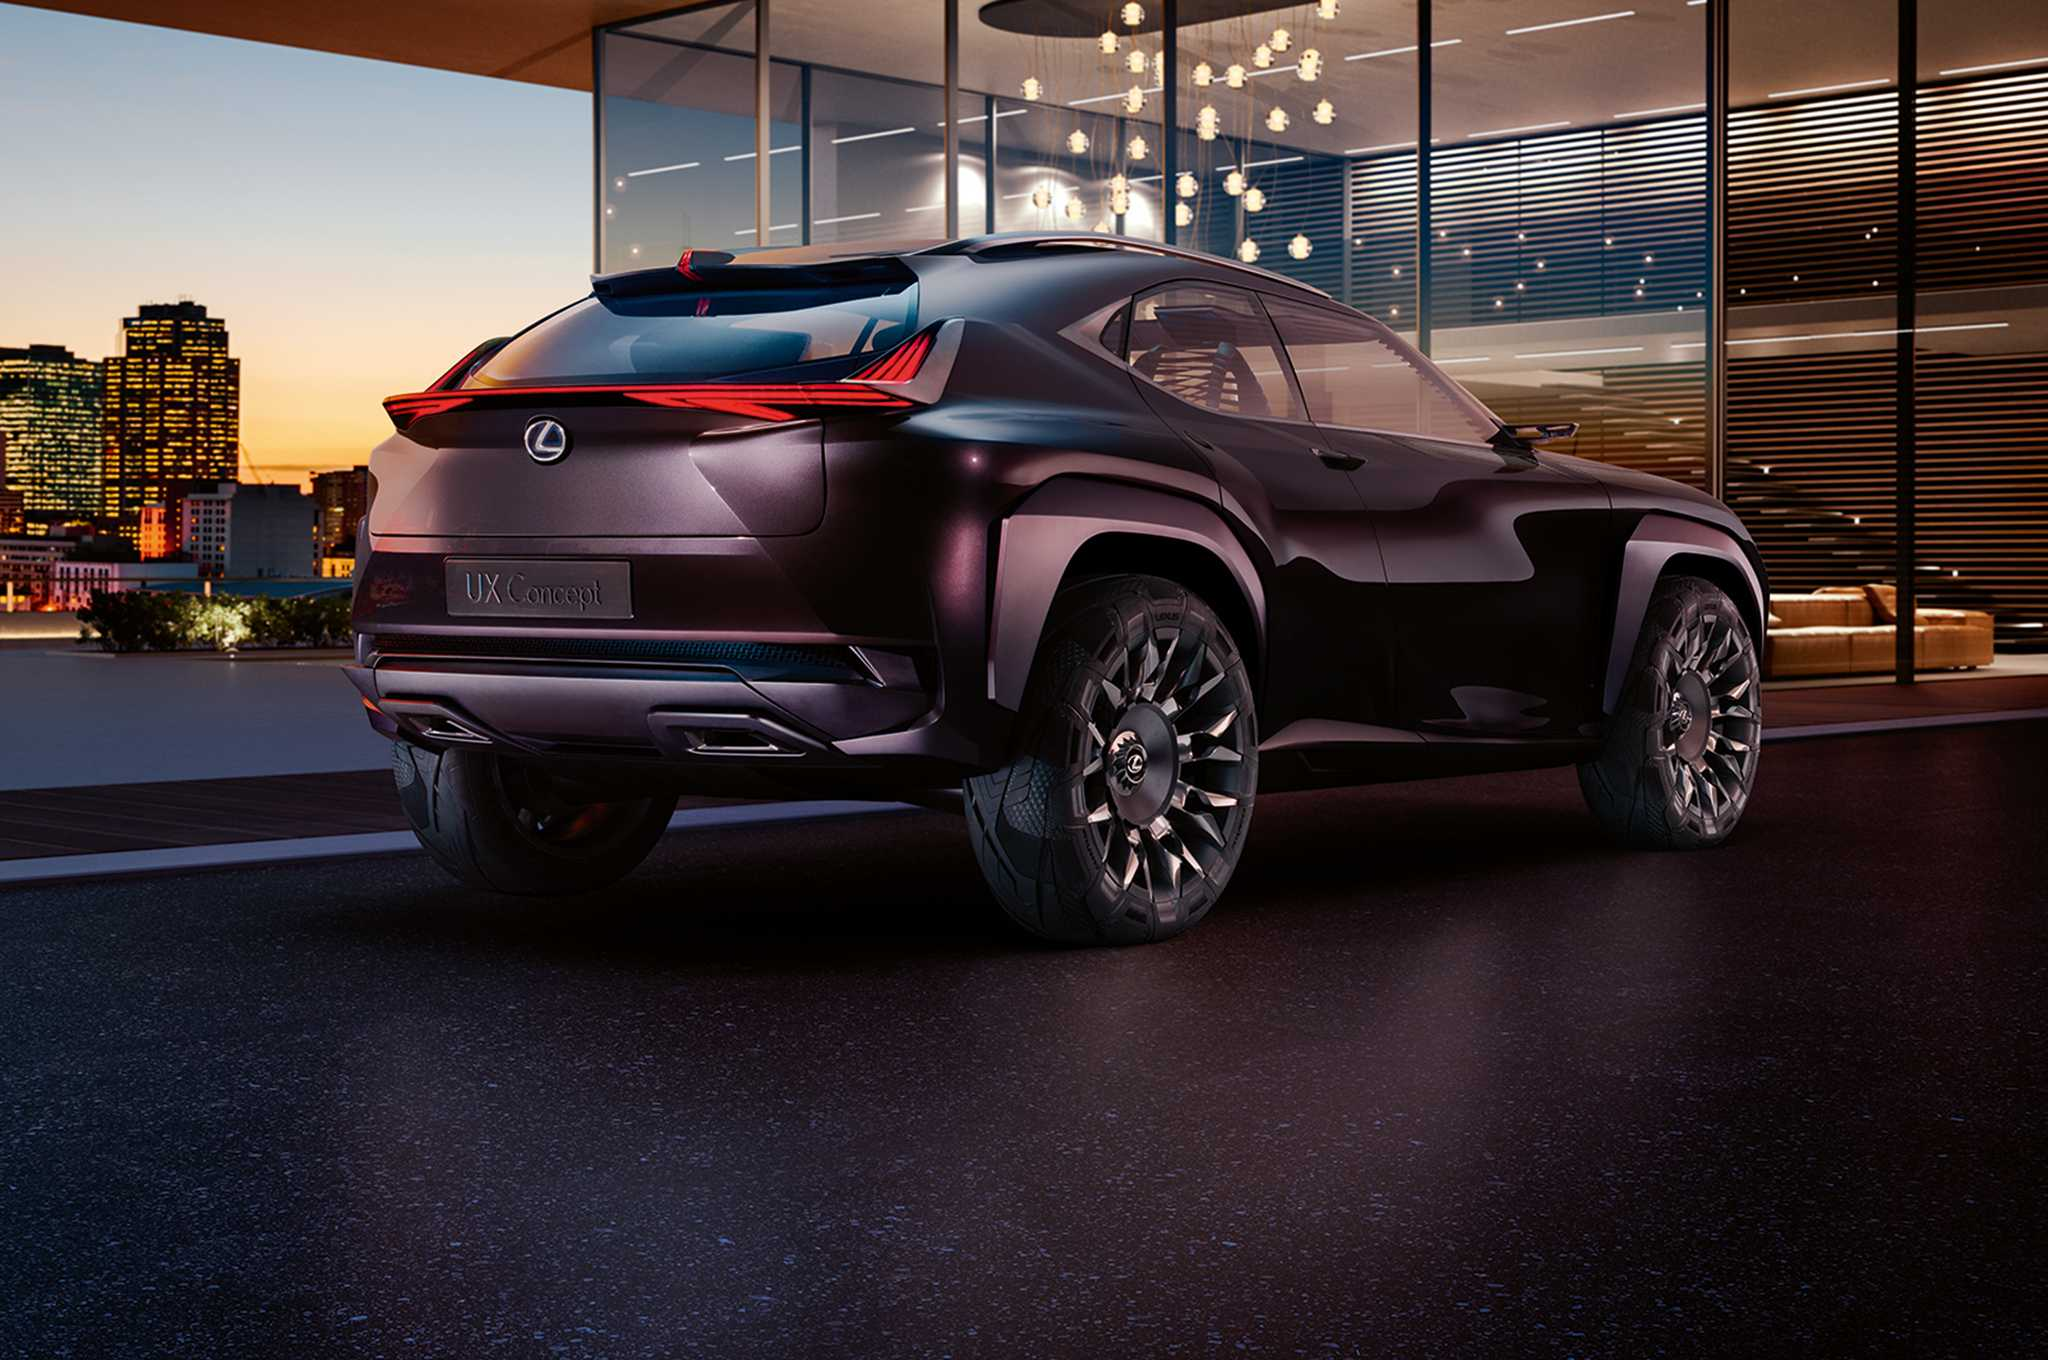 Lexus UX Concept Model Photos Revealed Ahead of Paris Auto Expo